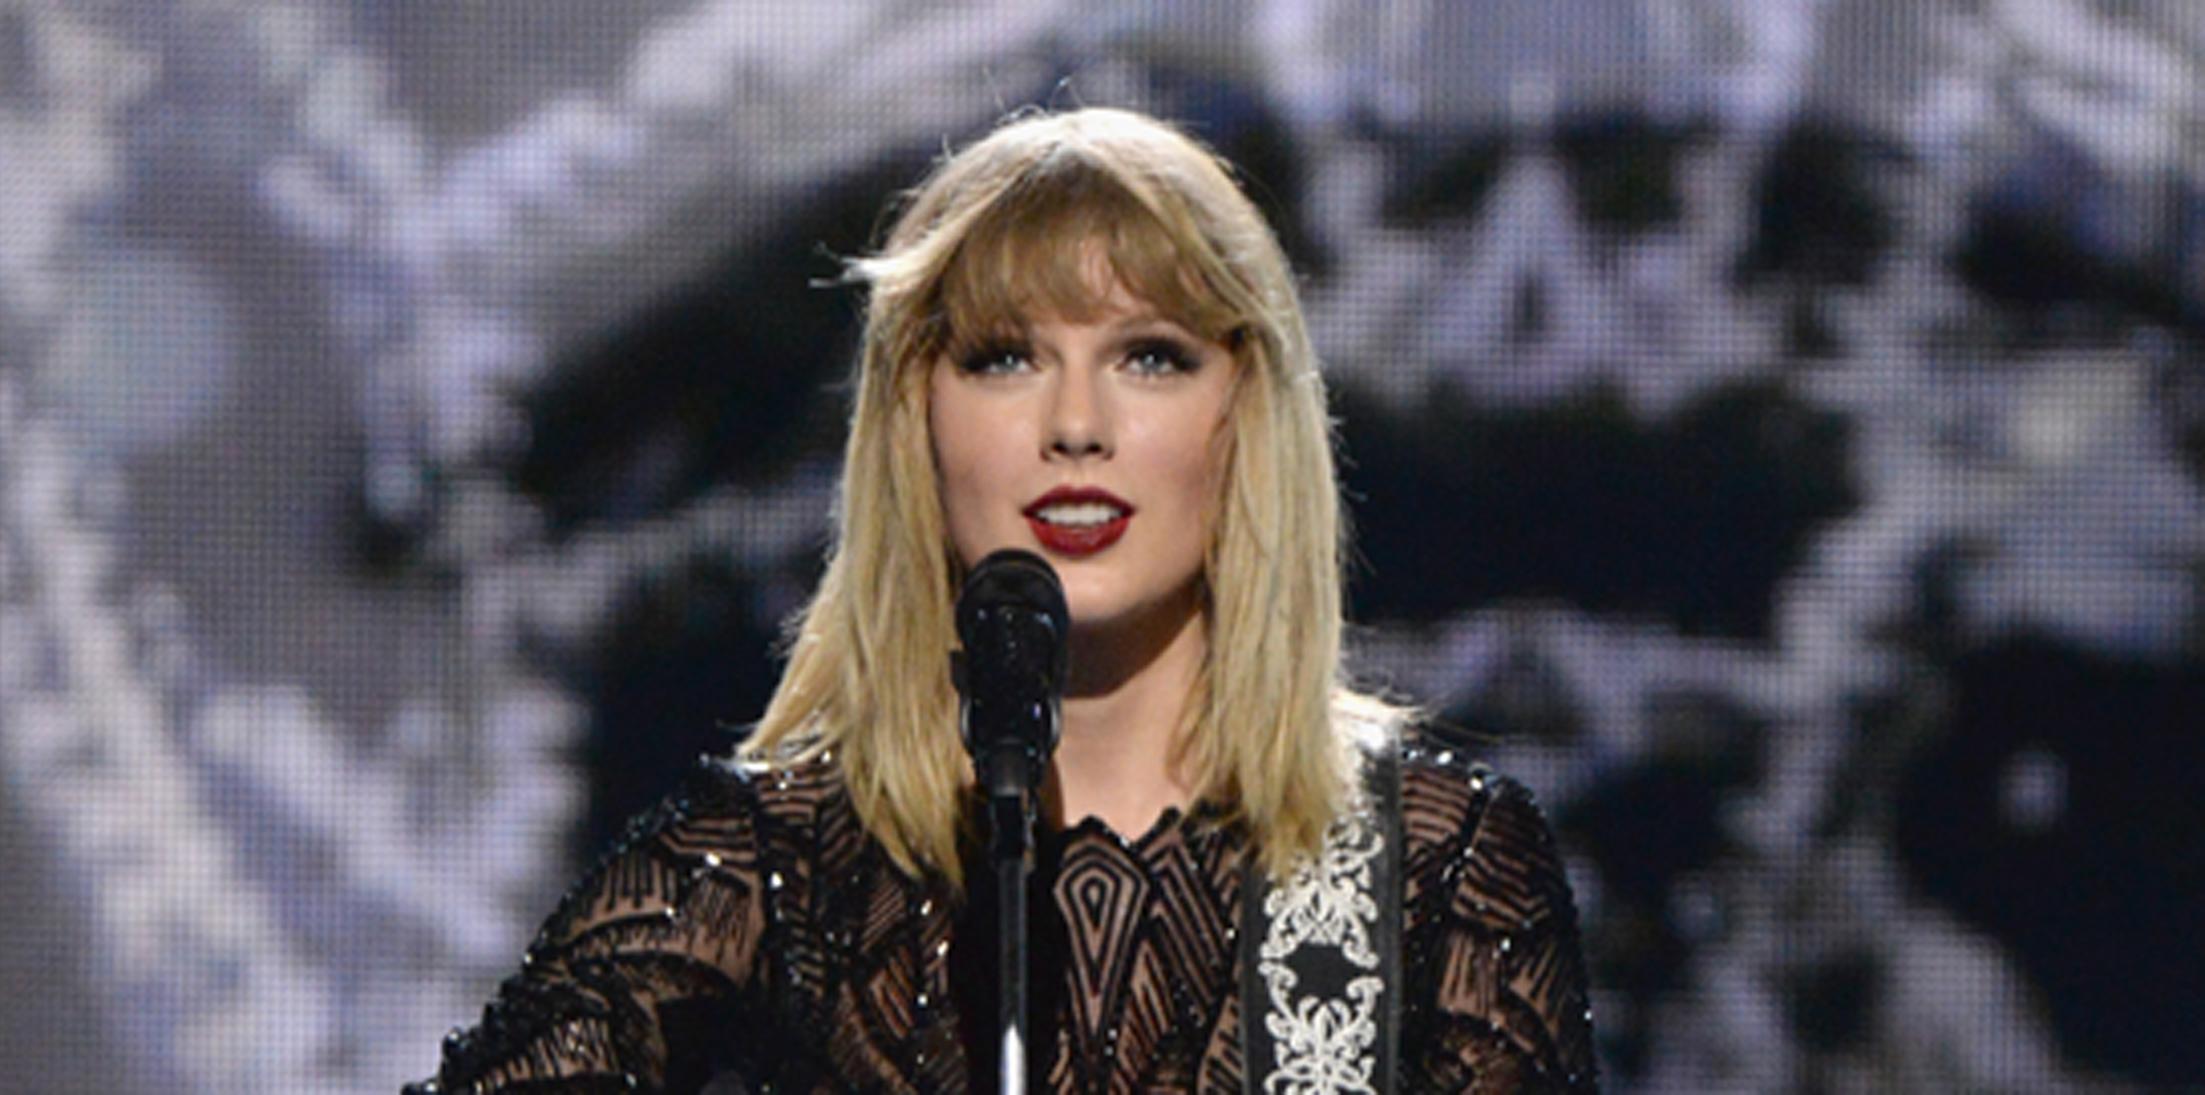 2017 DIRECTV NOW Super Saturday Night Concert In Houston – Taylor Swift Performance